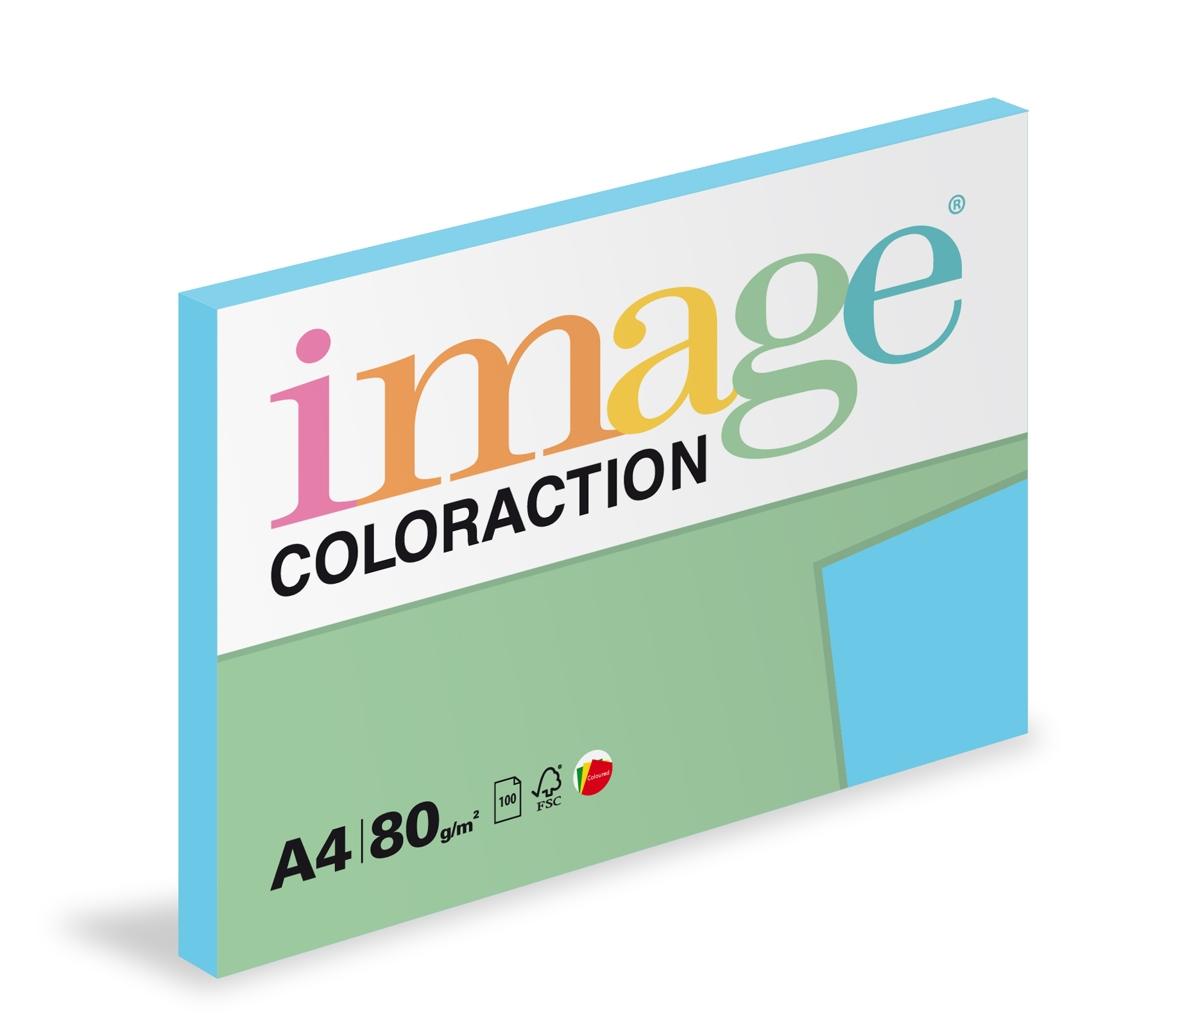 Papír kopírovací Coloraction A4 80 g modrá sytá 100 listů